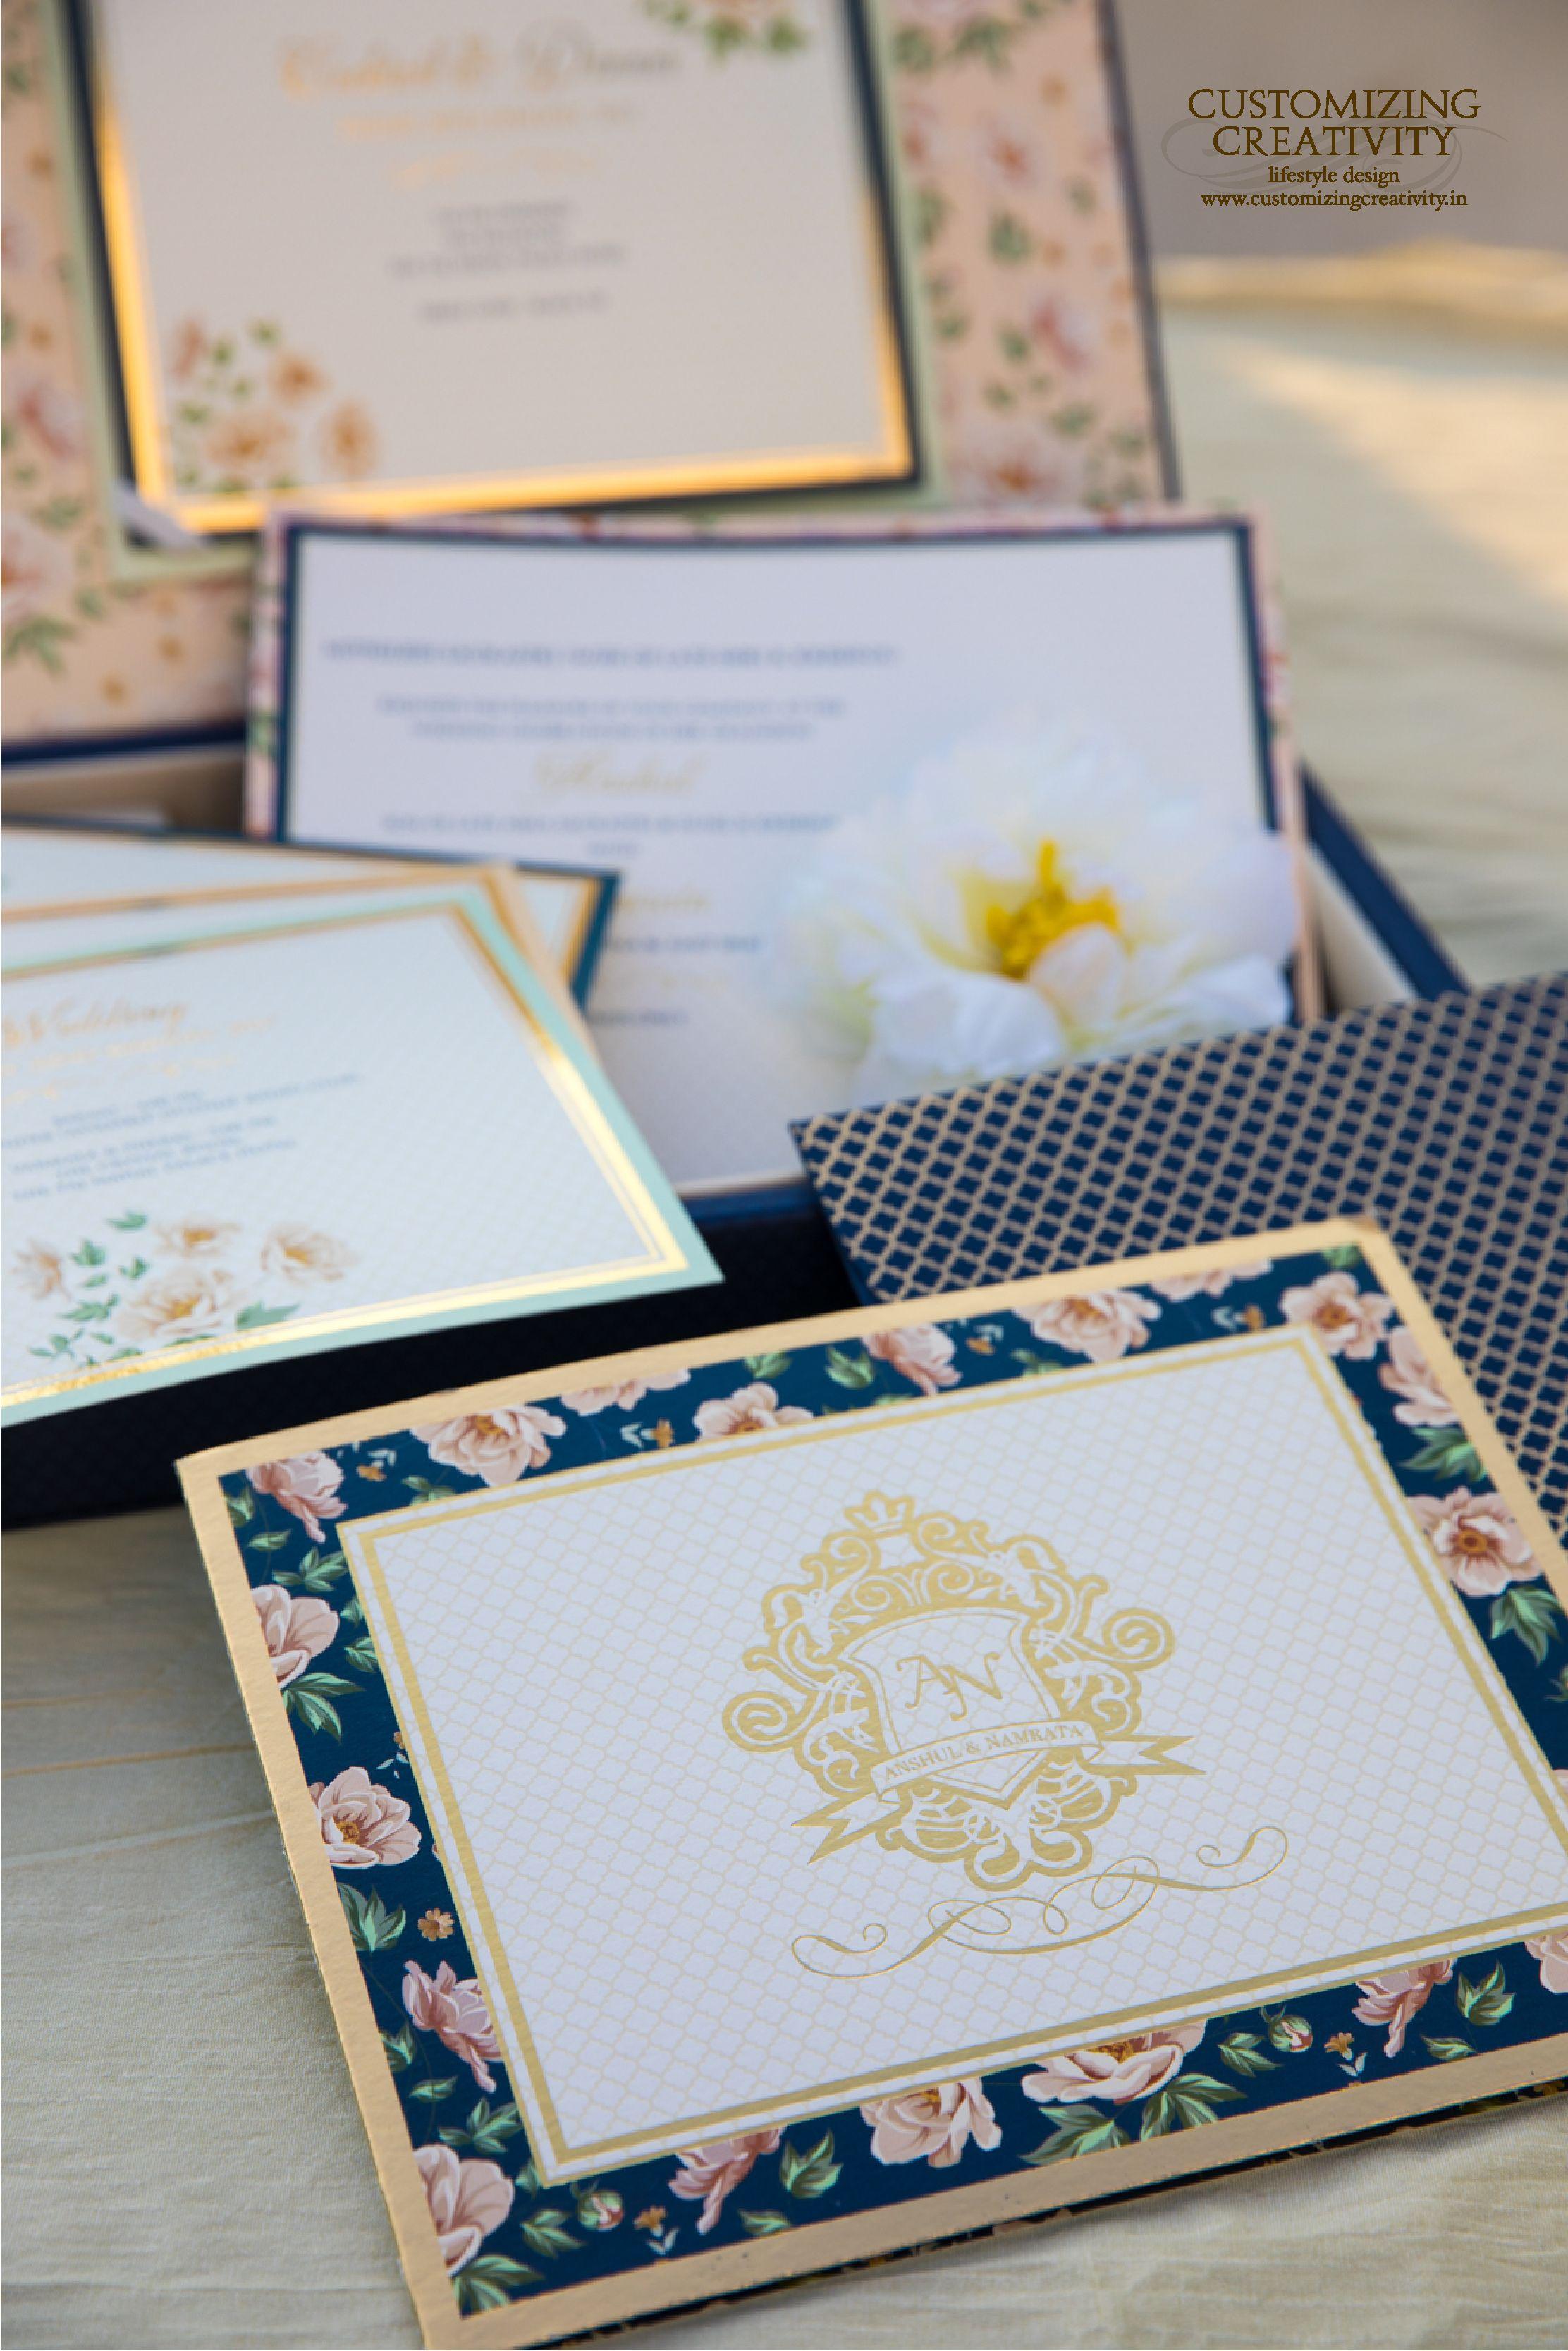 wedding invitation for friends india%0A Wedding Invitation cards  Indian wedding cards  invites  Wedding  Stationery  Customized invitations